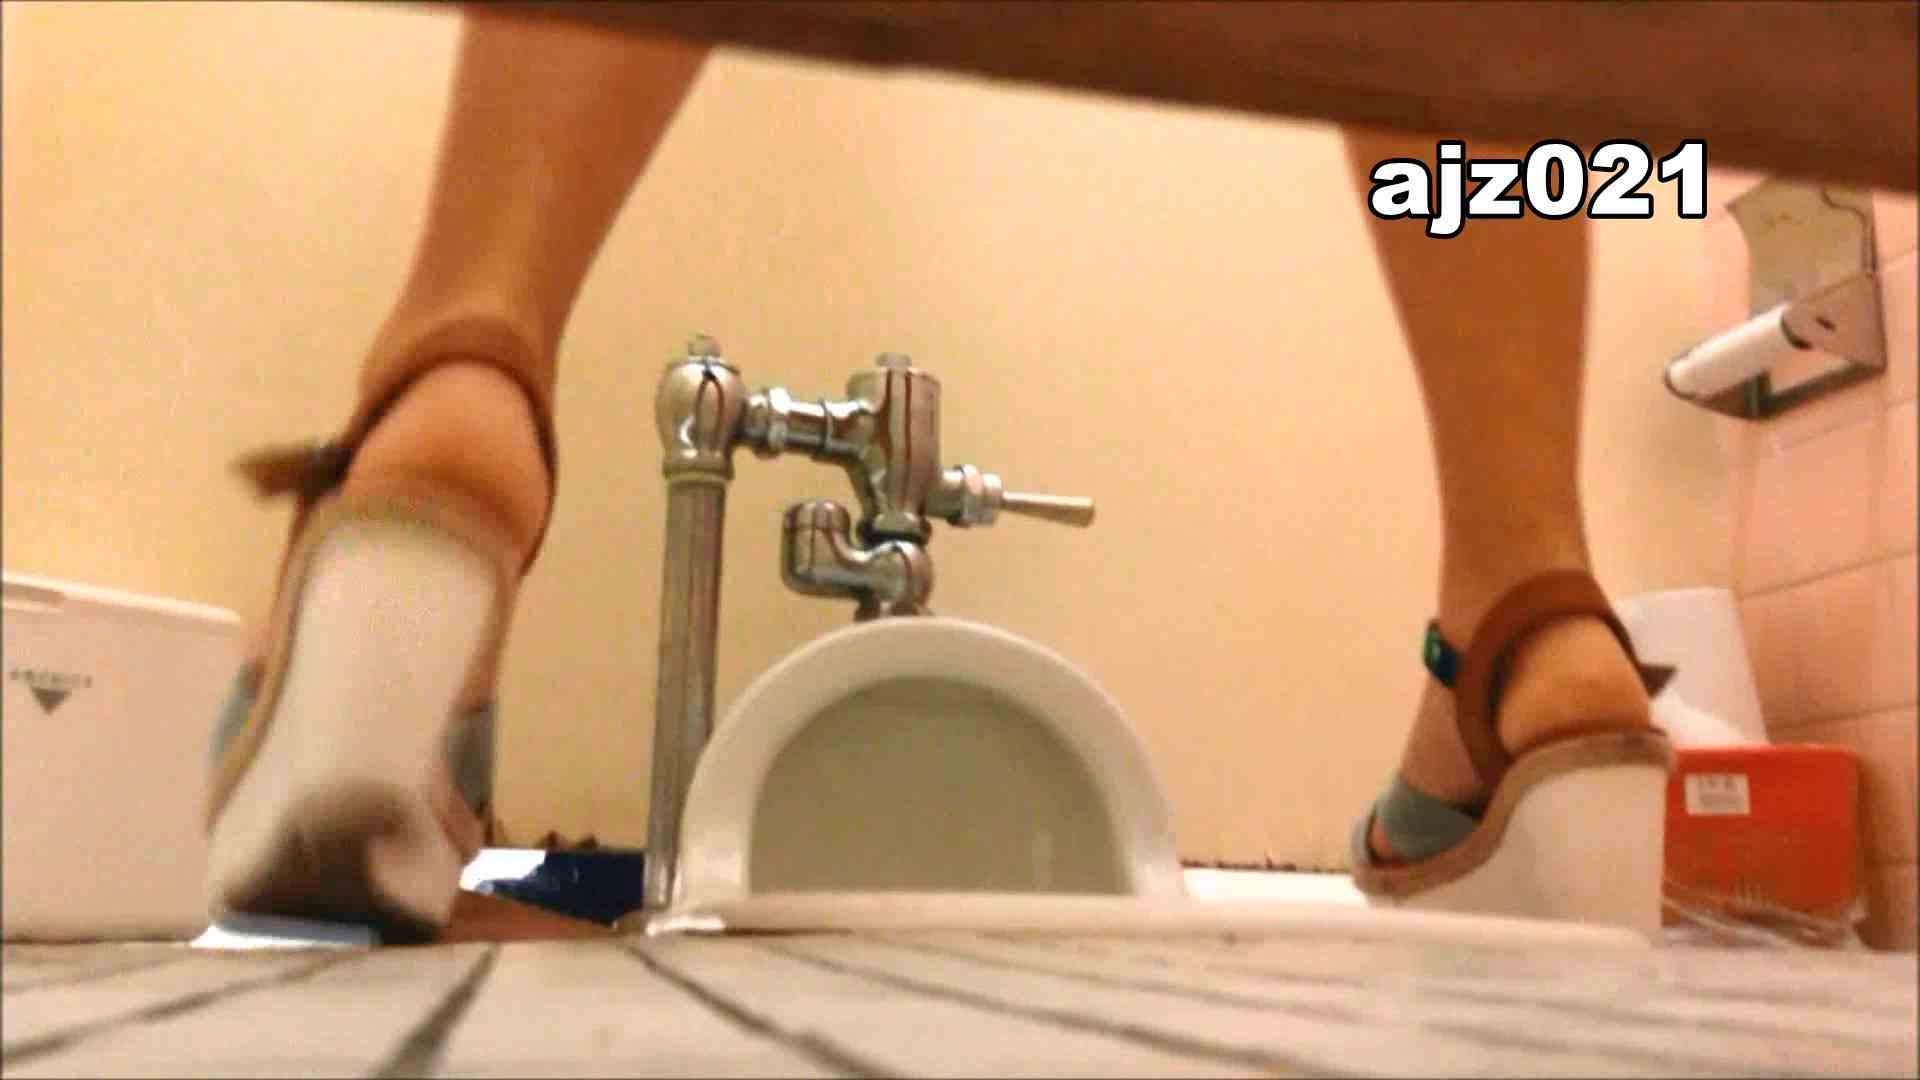 某有名大学女性洗面所 vol.21 美しいOLの裸体 濡れ場動画紹介 91pic 6